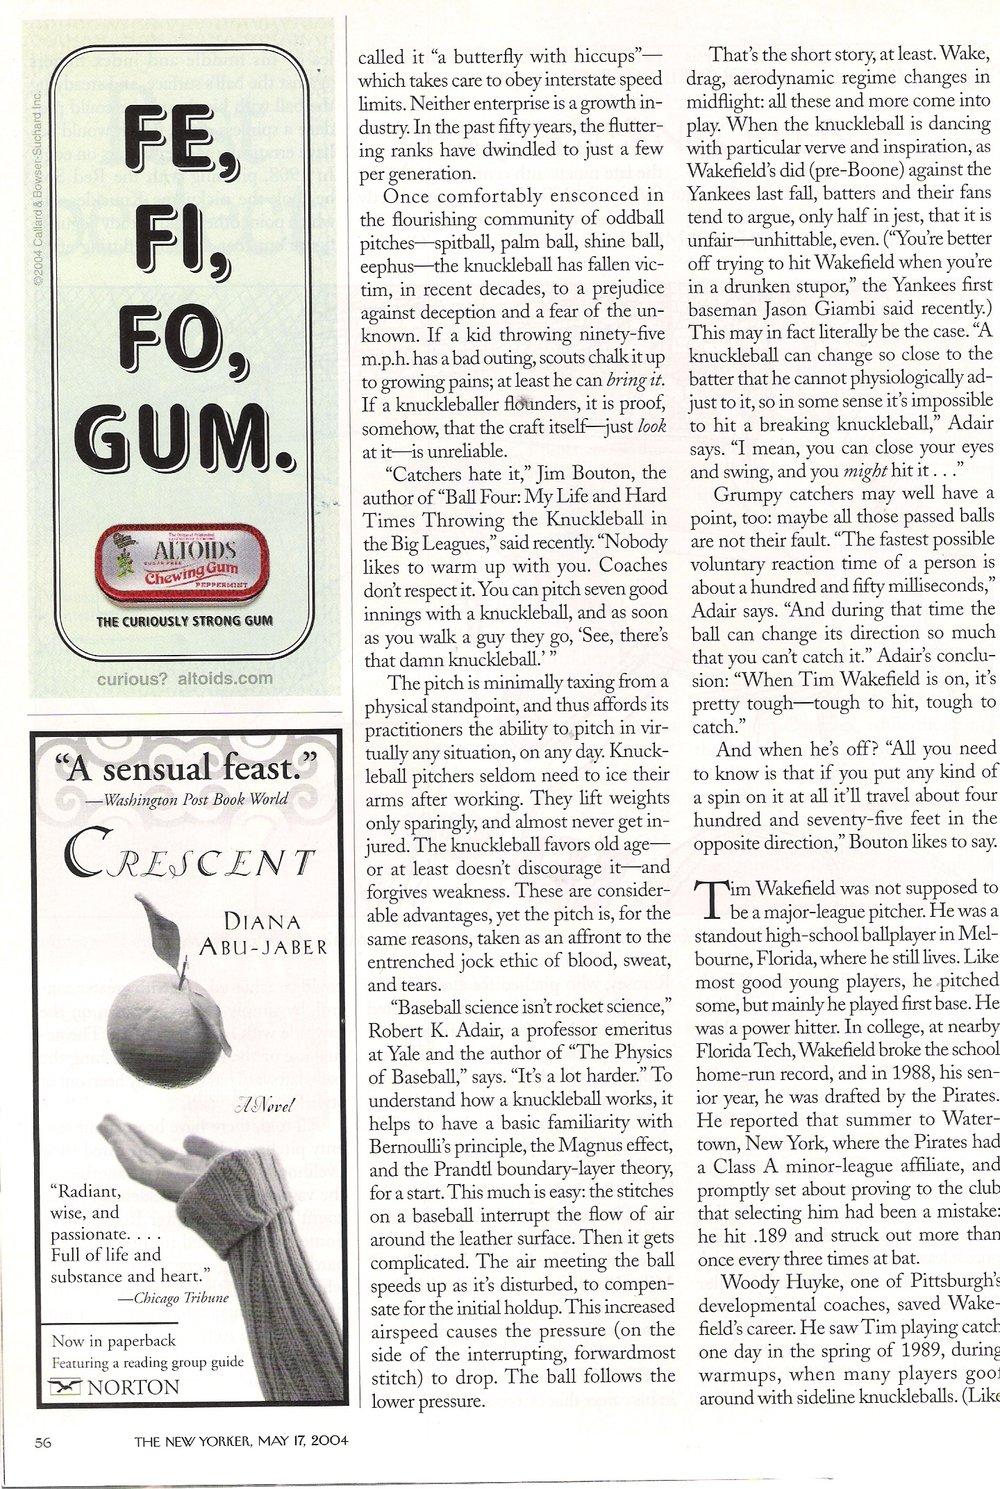 Altoids - Gum (Print)